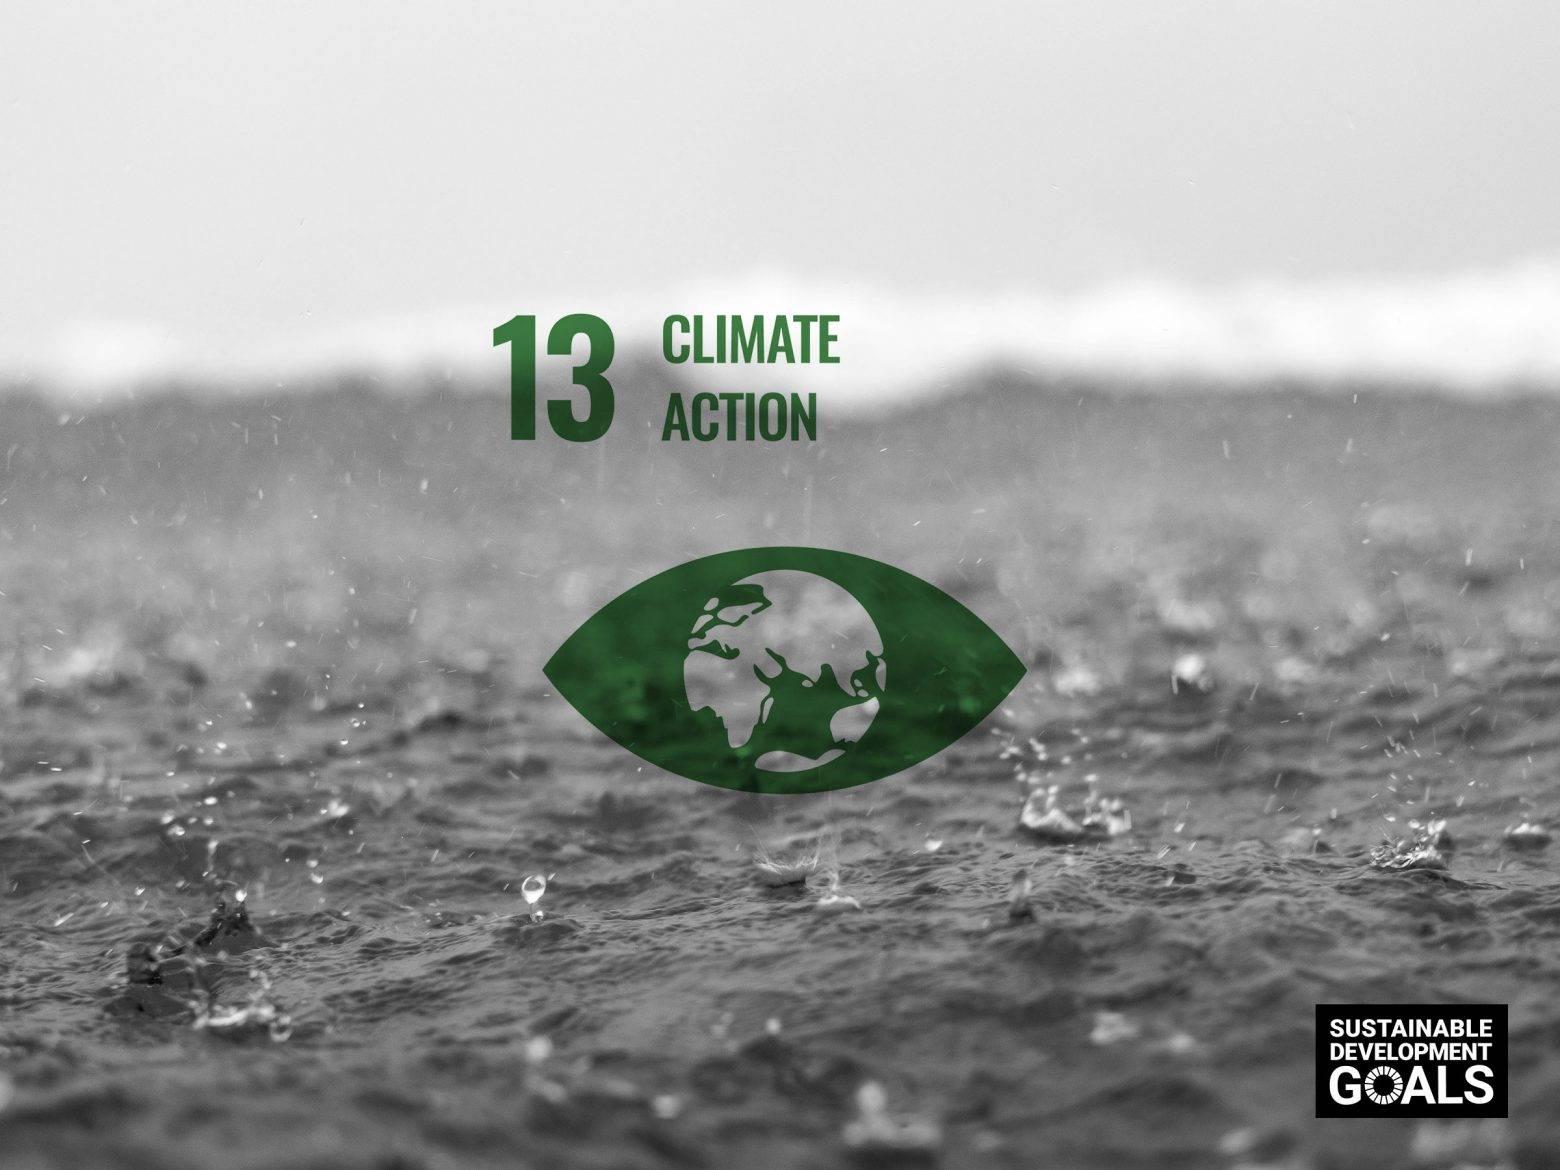 https://www.soulandsurf.com/wp-content/uploads/2021/08/our-sustainable-ish-plan-S_S-UNSDG-Climate-Action-e1628601818102.jpg Image